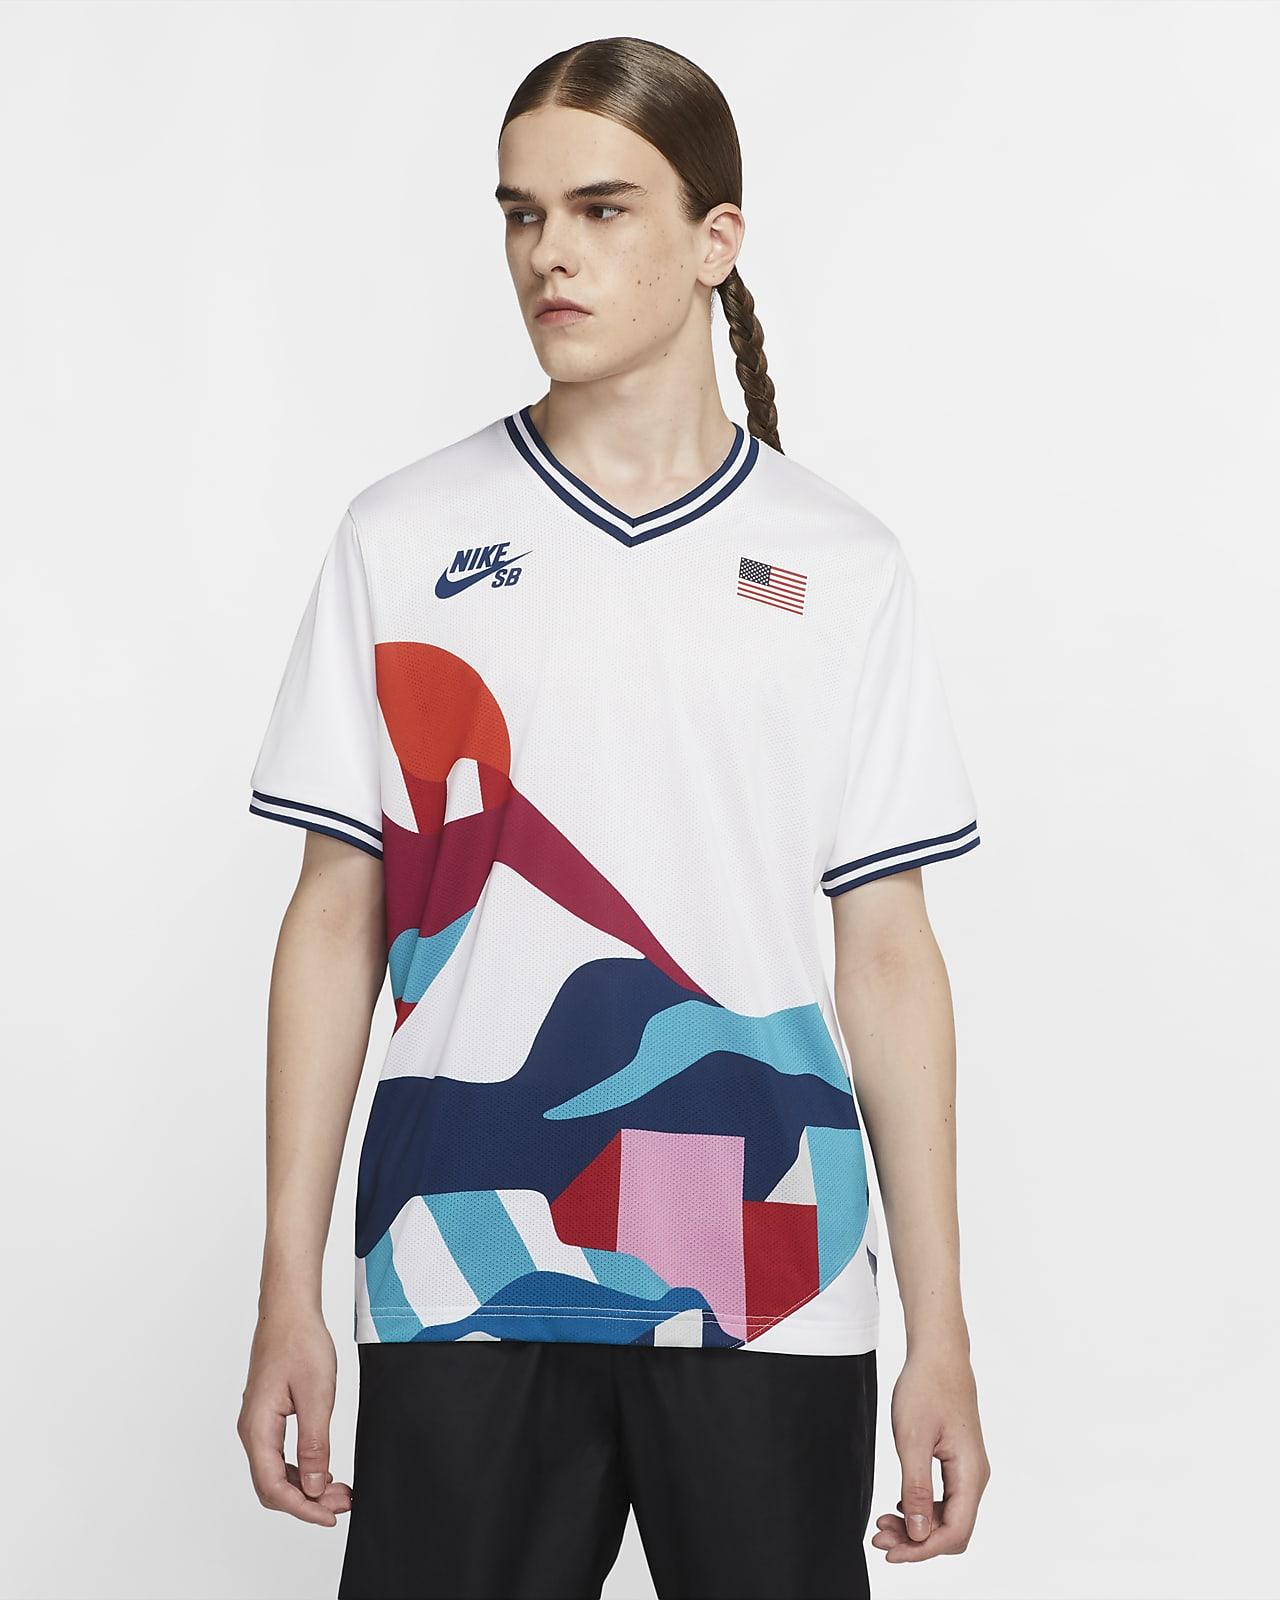 Nike SB Team USA Skate Jersey